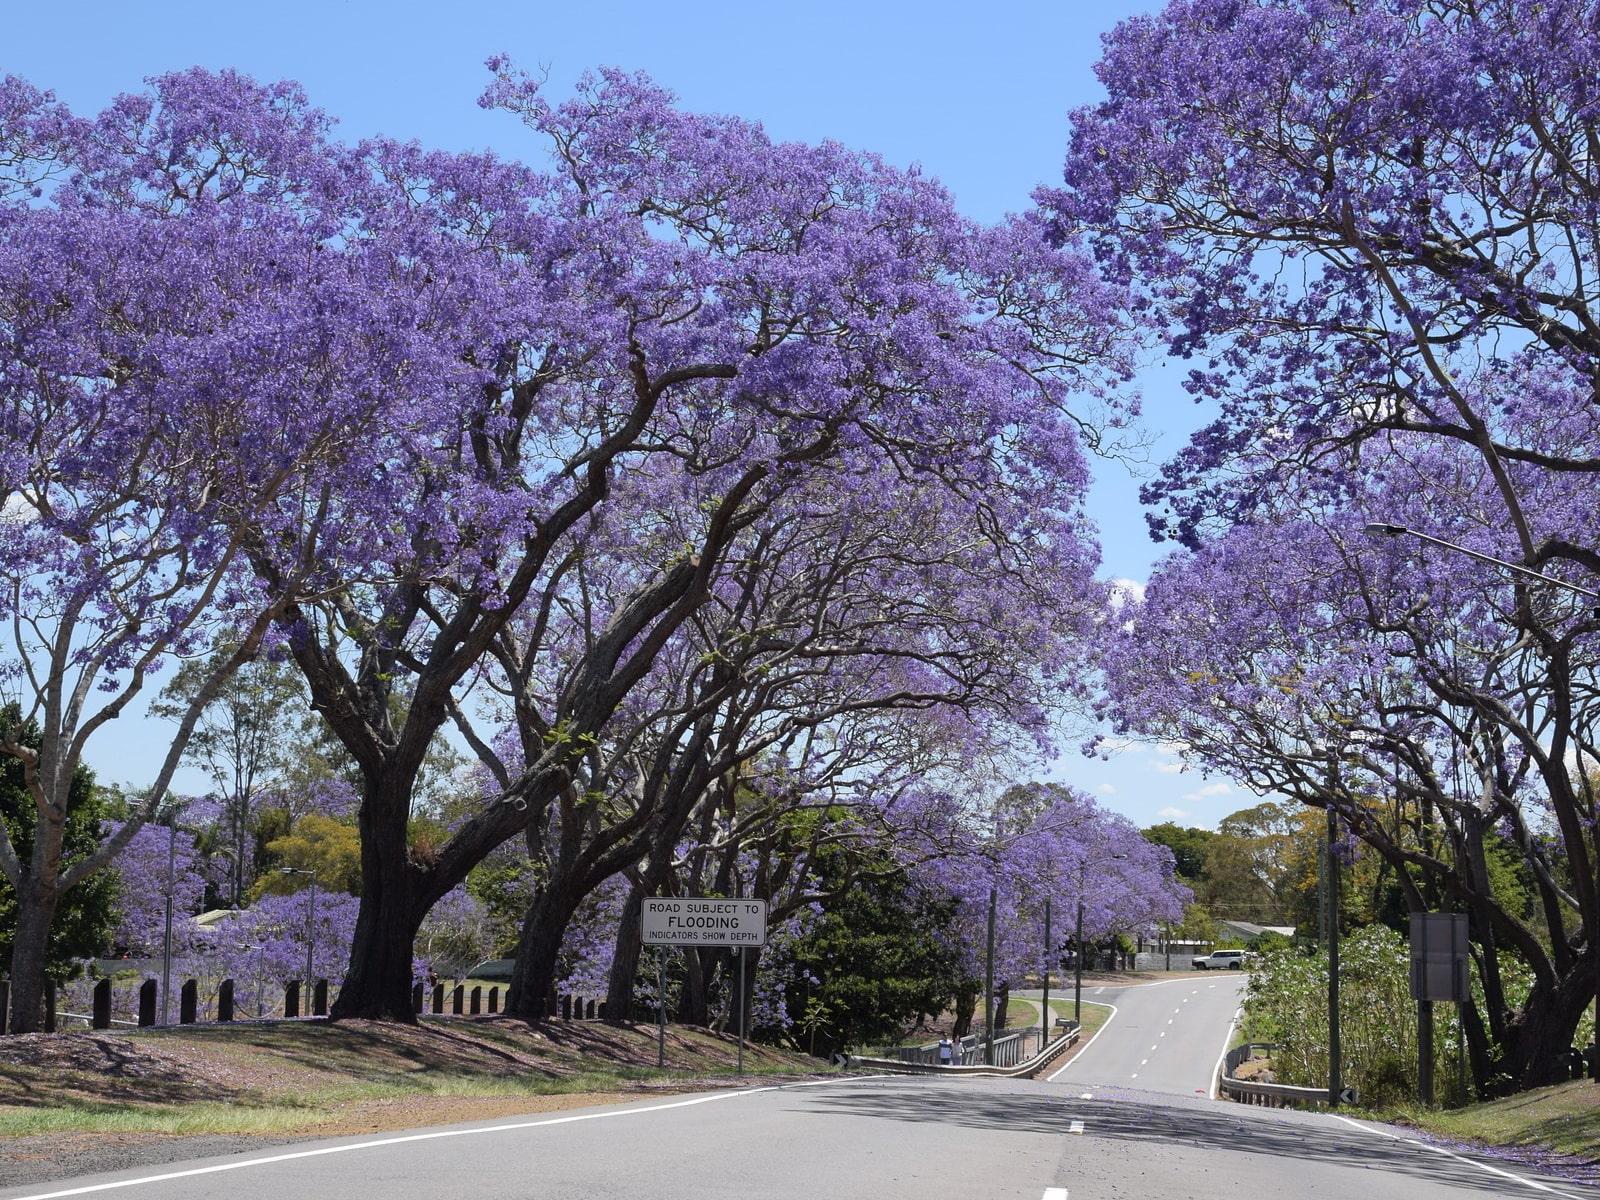 джакаранда фиалковое дерево